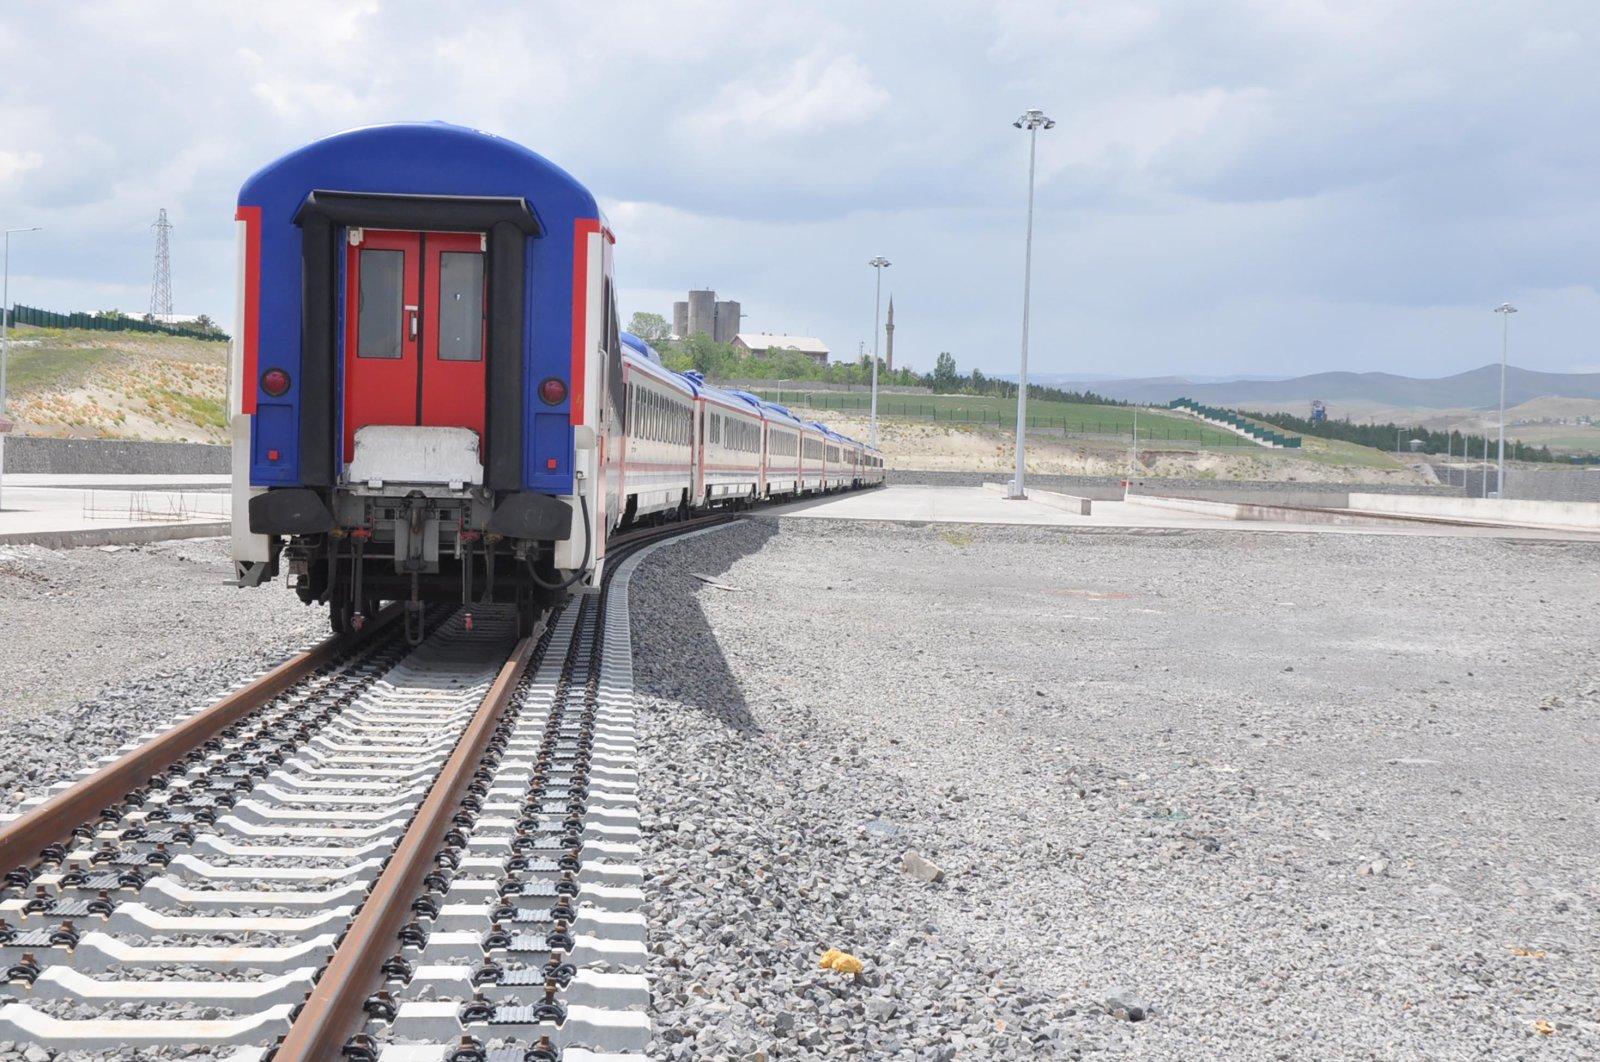 A train travels on the Baku-Tbilisi-Kars (BTK) railway line in Kars, eastern Turkey, June 13, 2021. (DHA Photo)